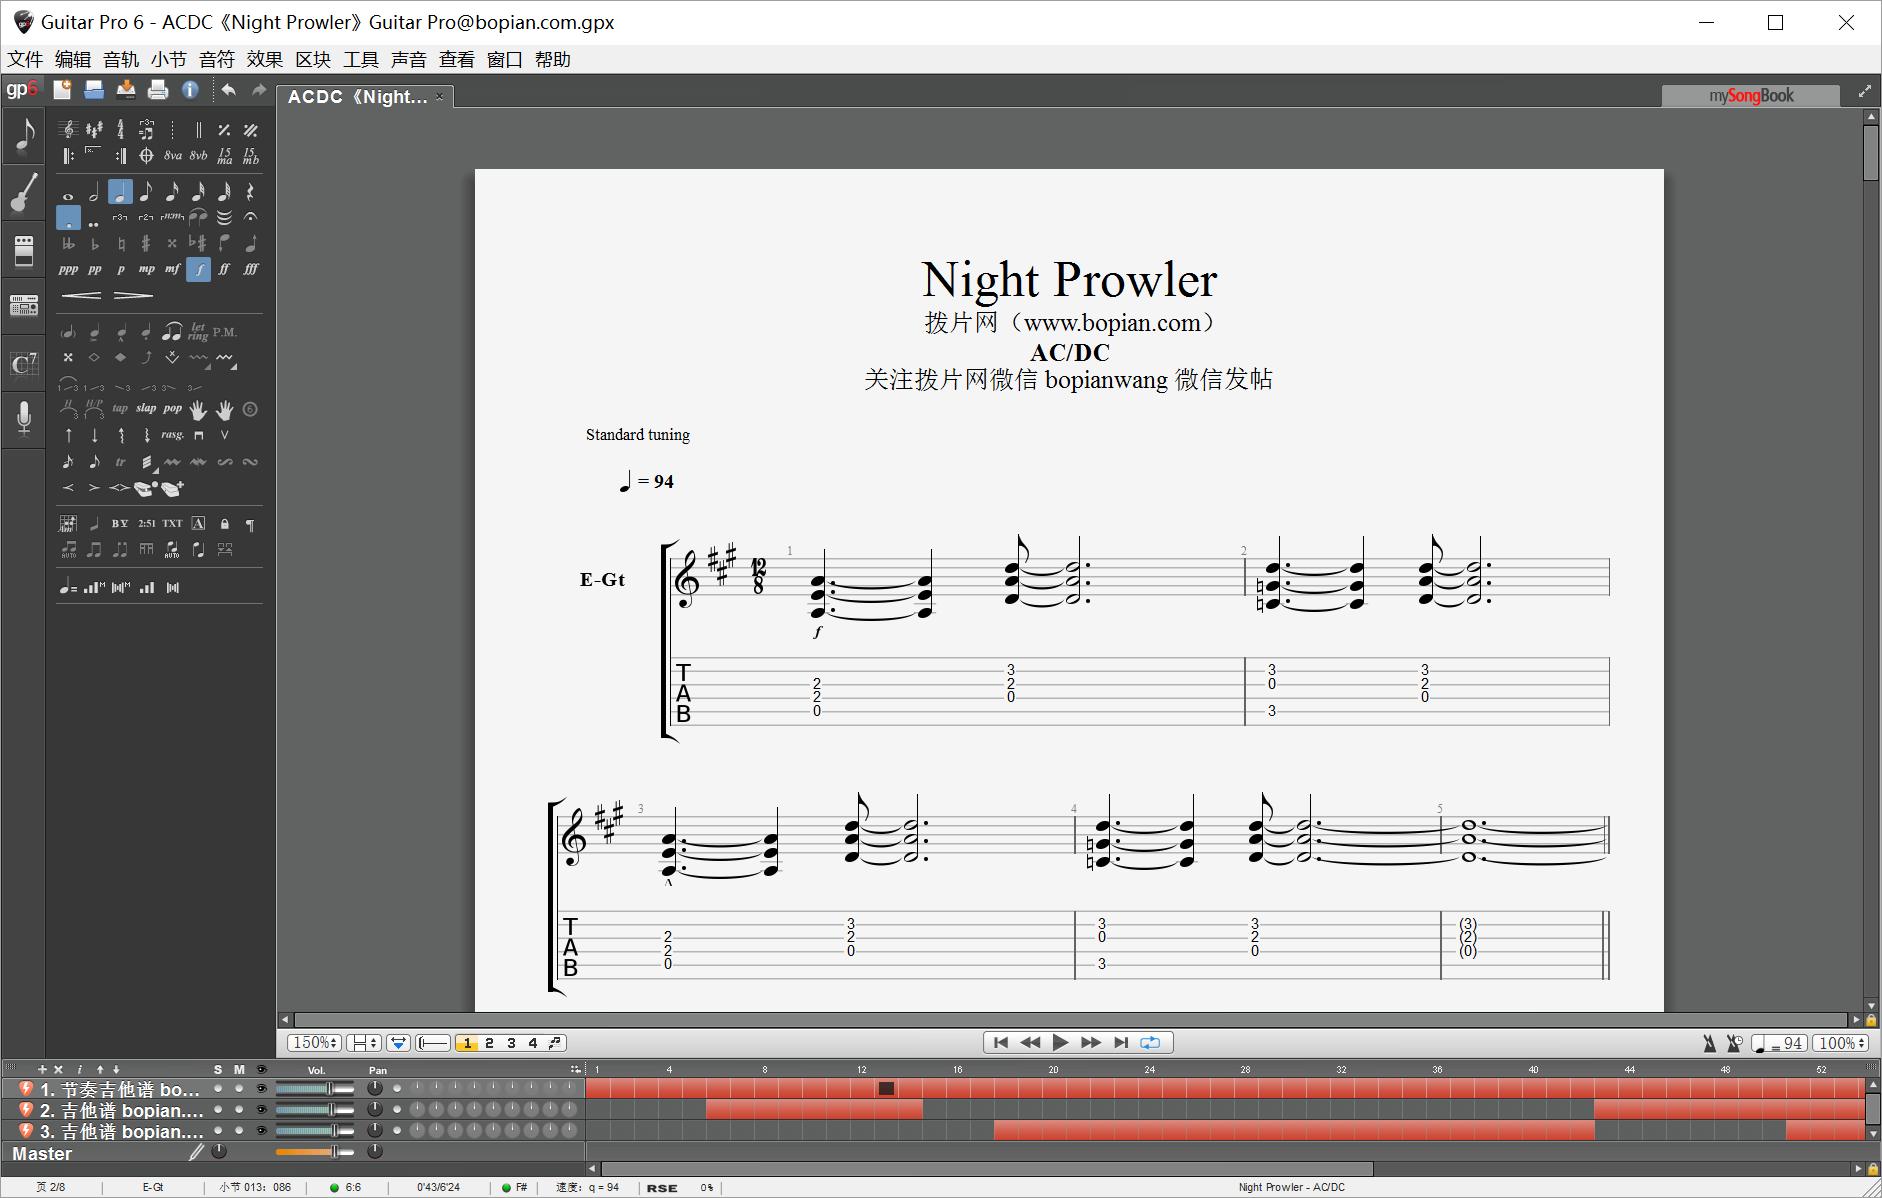 拨片网_乐队谱_ACDC《Night_Prowler》Guitar_Pro@bopian.com_.png